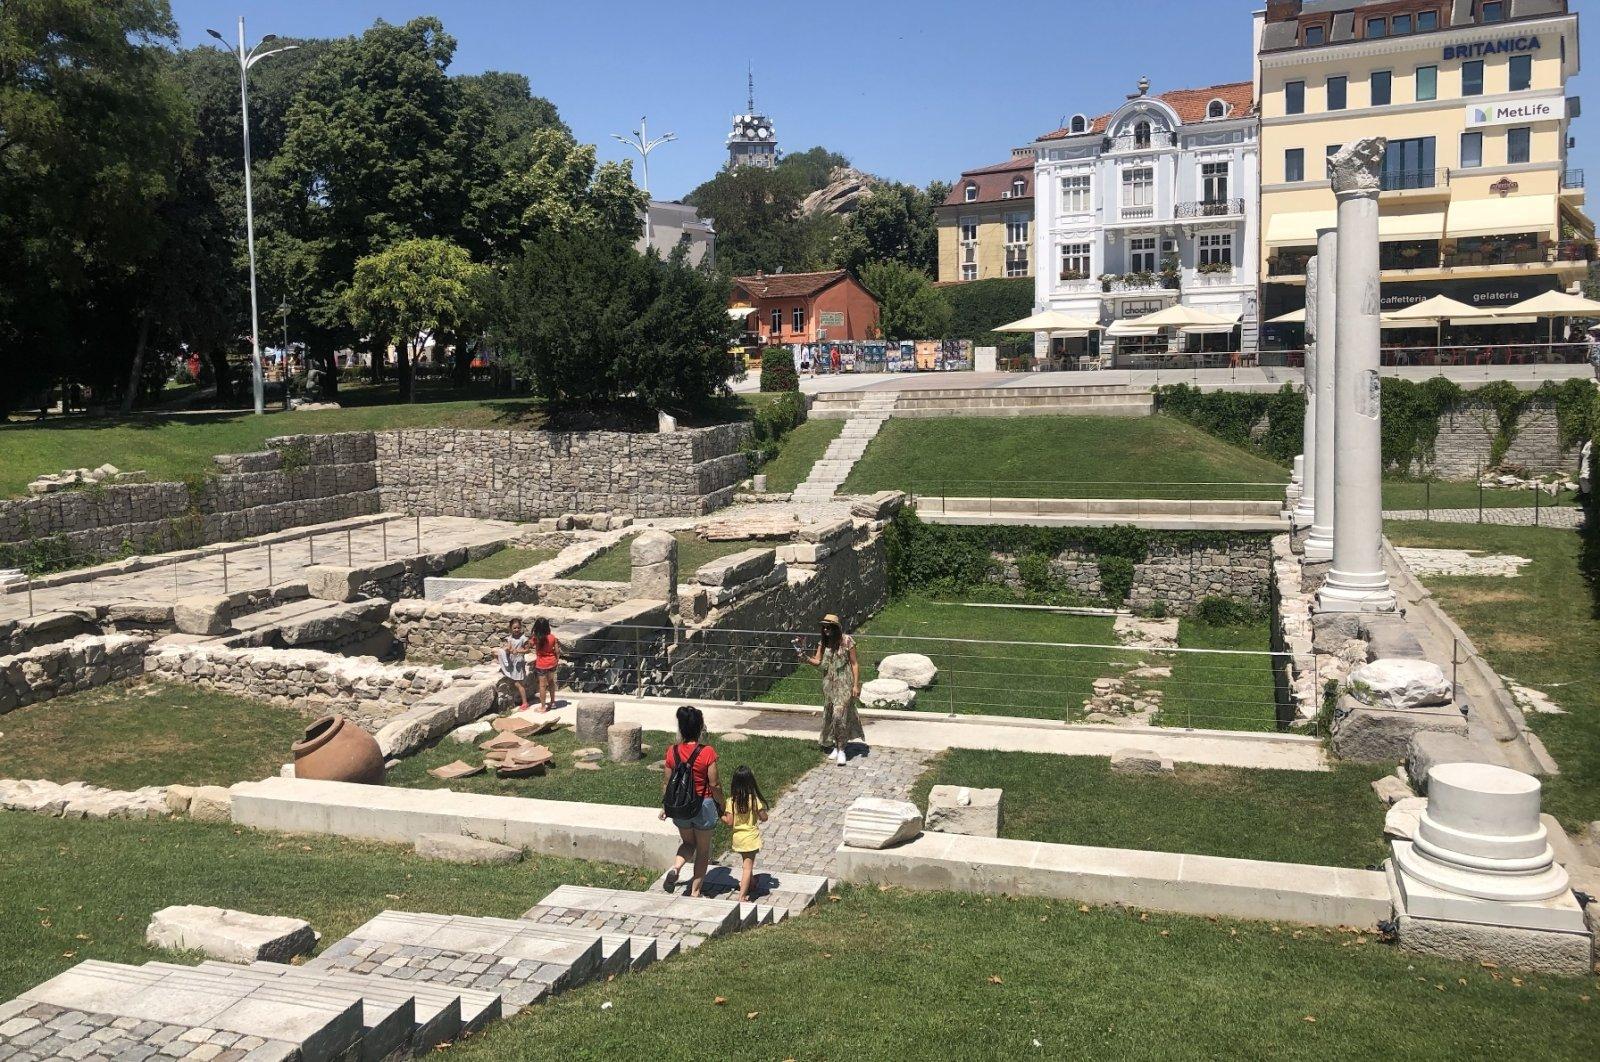 The ruins in Plovdiv, Bulgaria. (Photos by Emre Başaran)